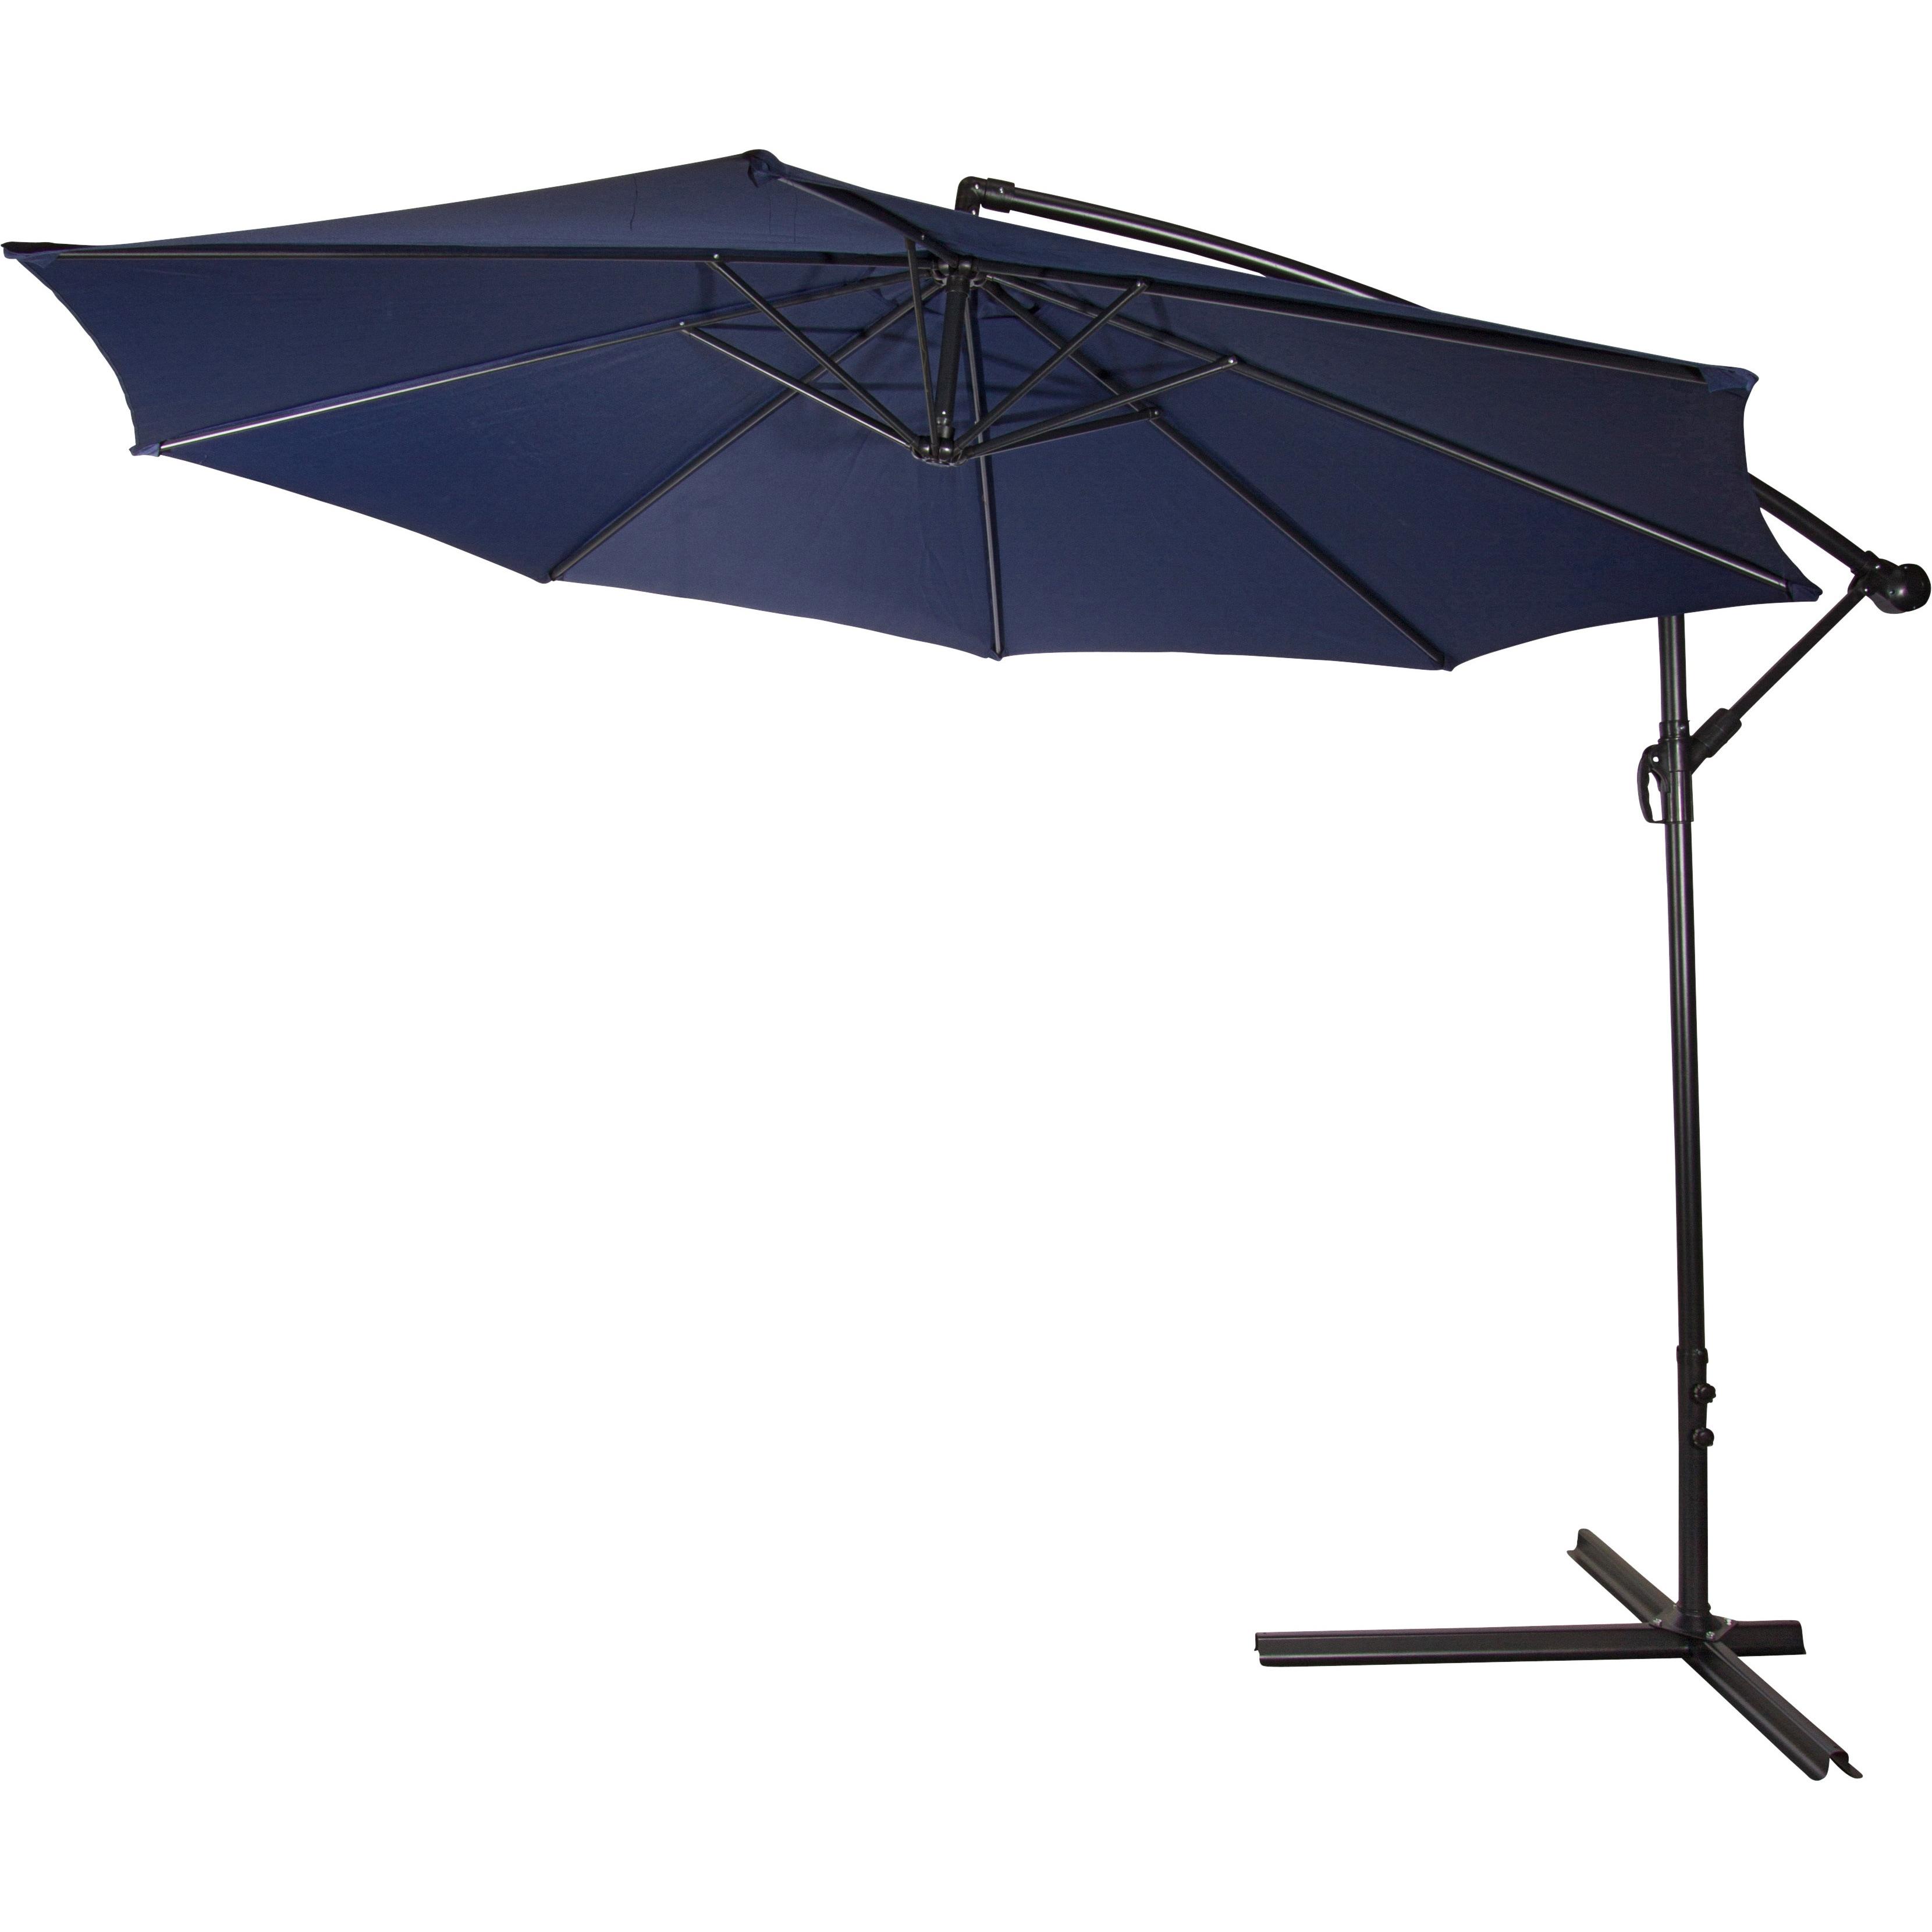 10 foot Deluxe fset Patio Umbrella Free Shipping Today